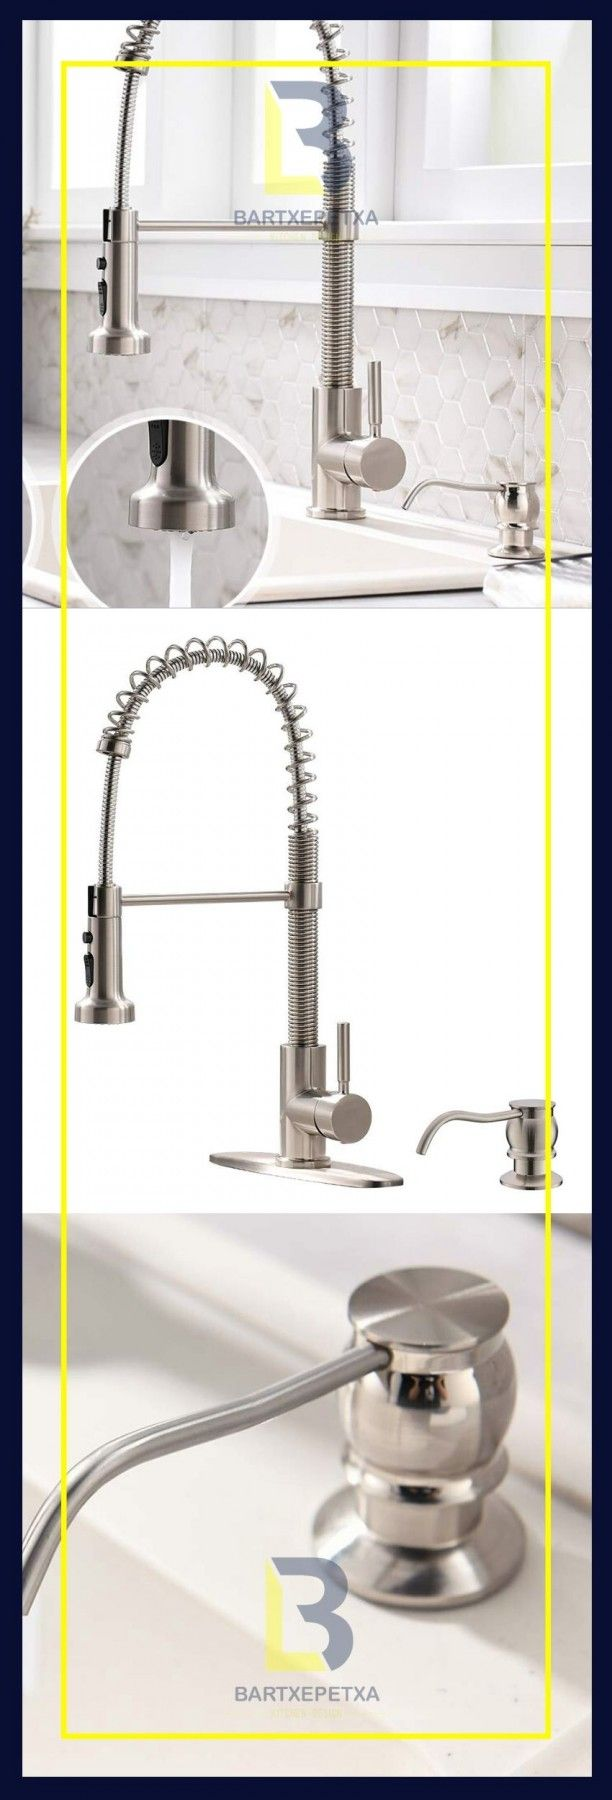 Dish Soap Dispenser For Kitchen Soap Pump Dispenser Sink Soap Dispenser Dish Soap Dispenser